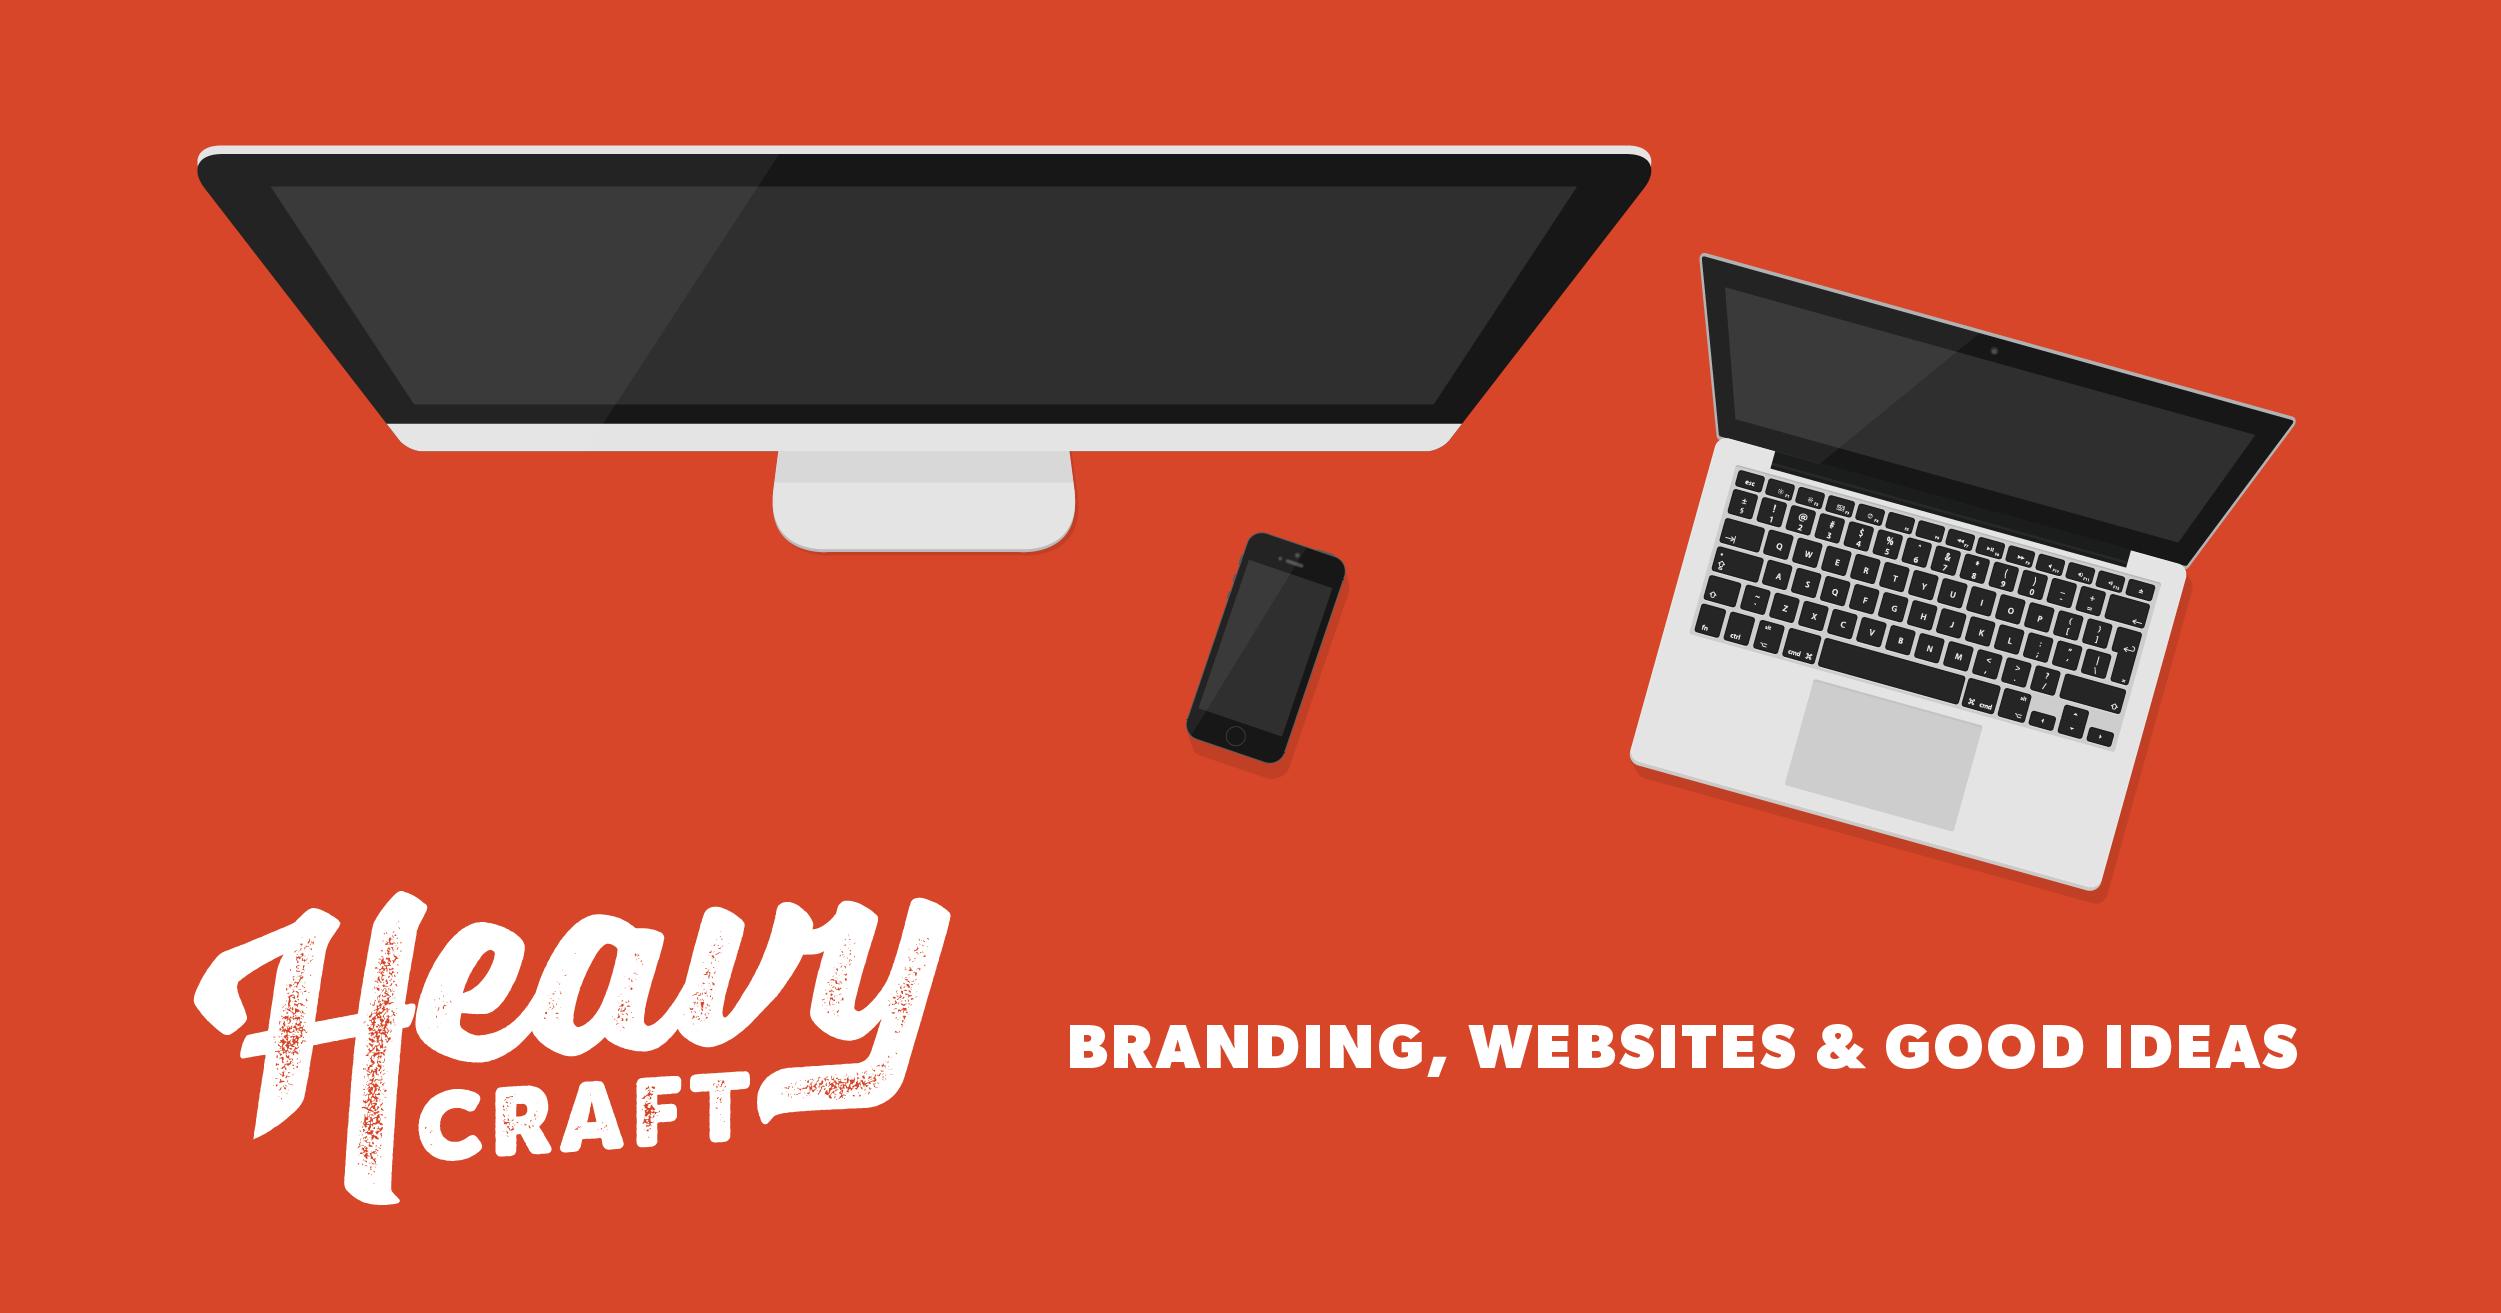 Website Design And Development For Craft Beverage Food And